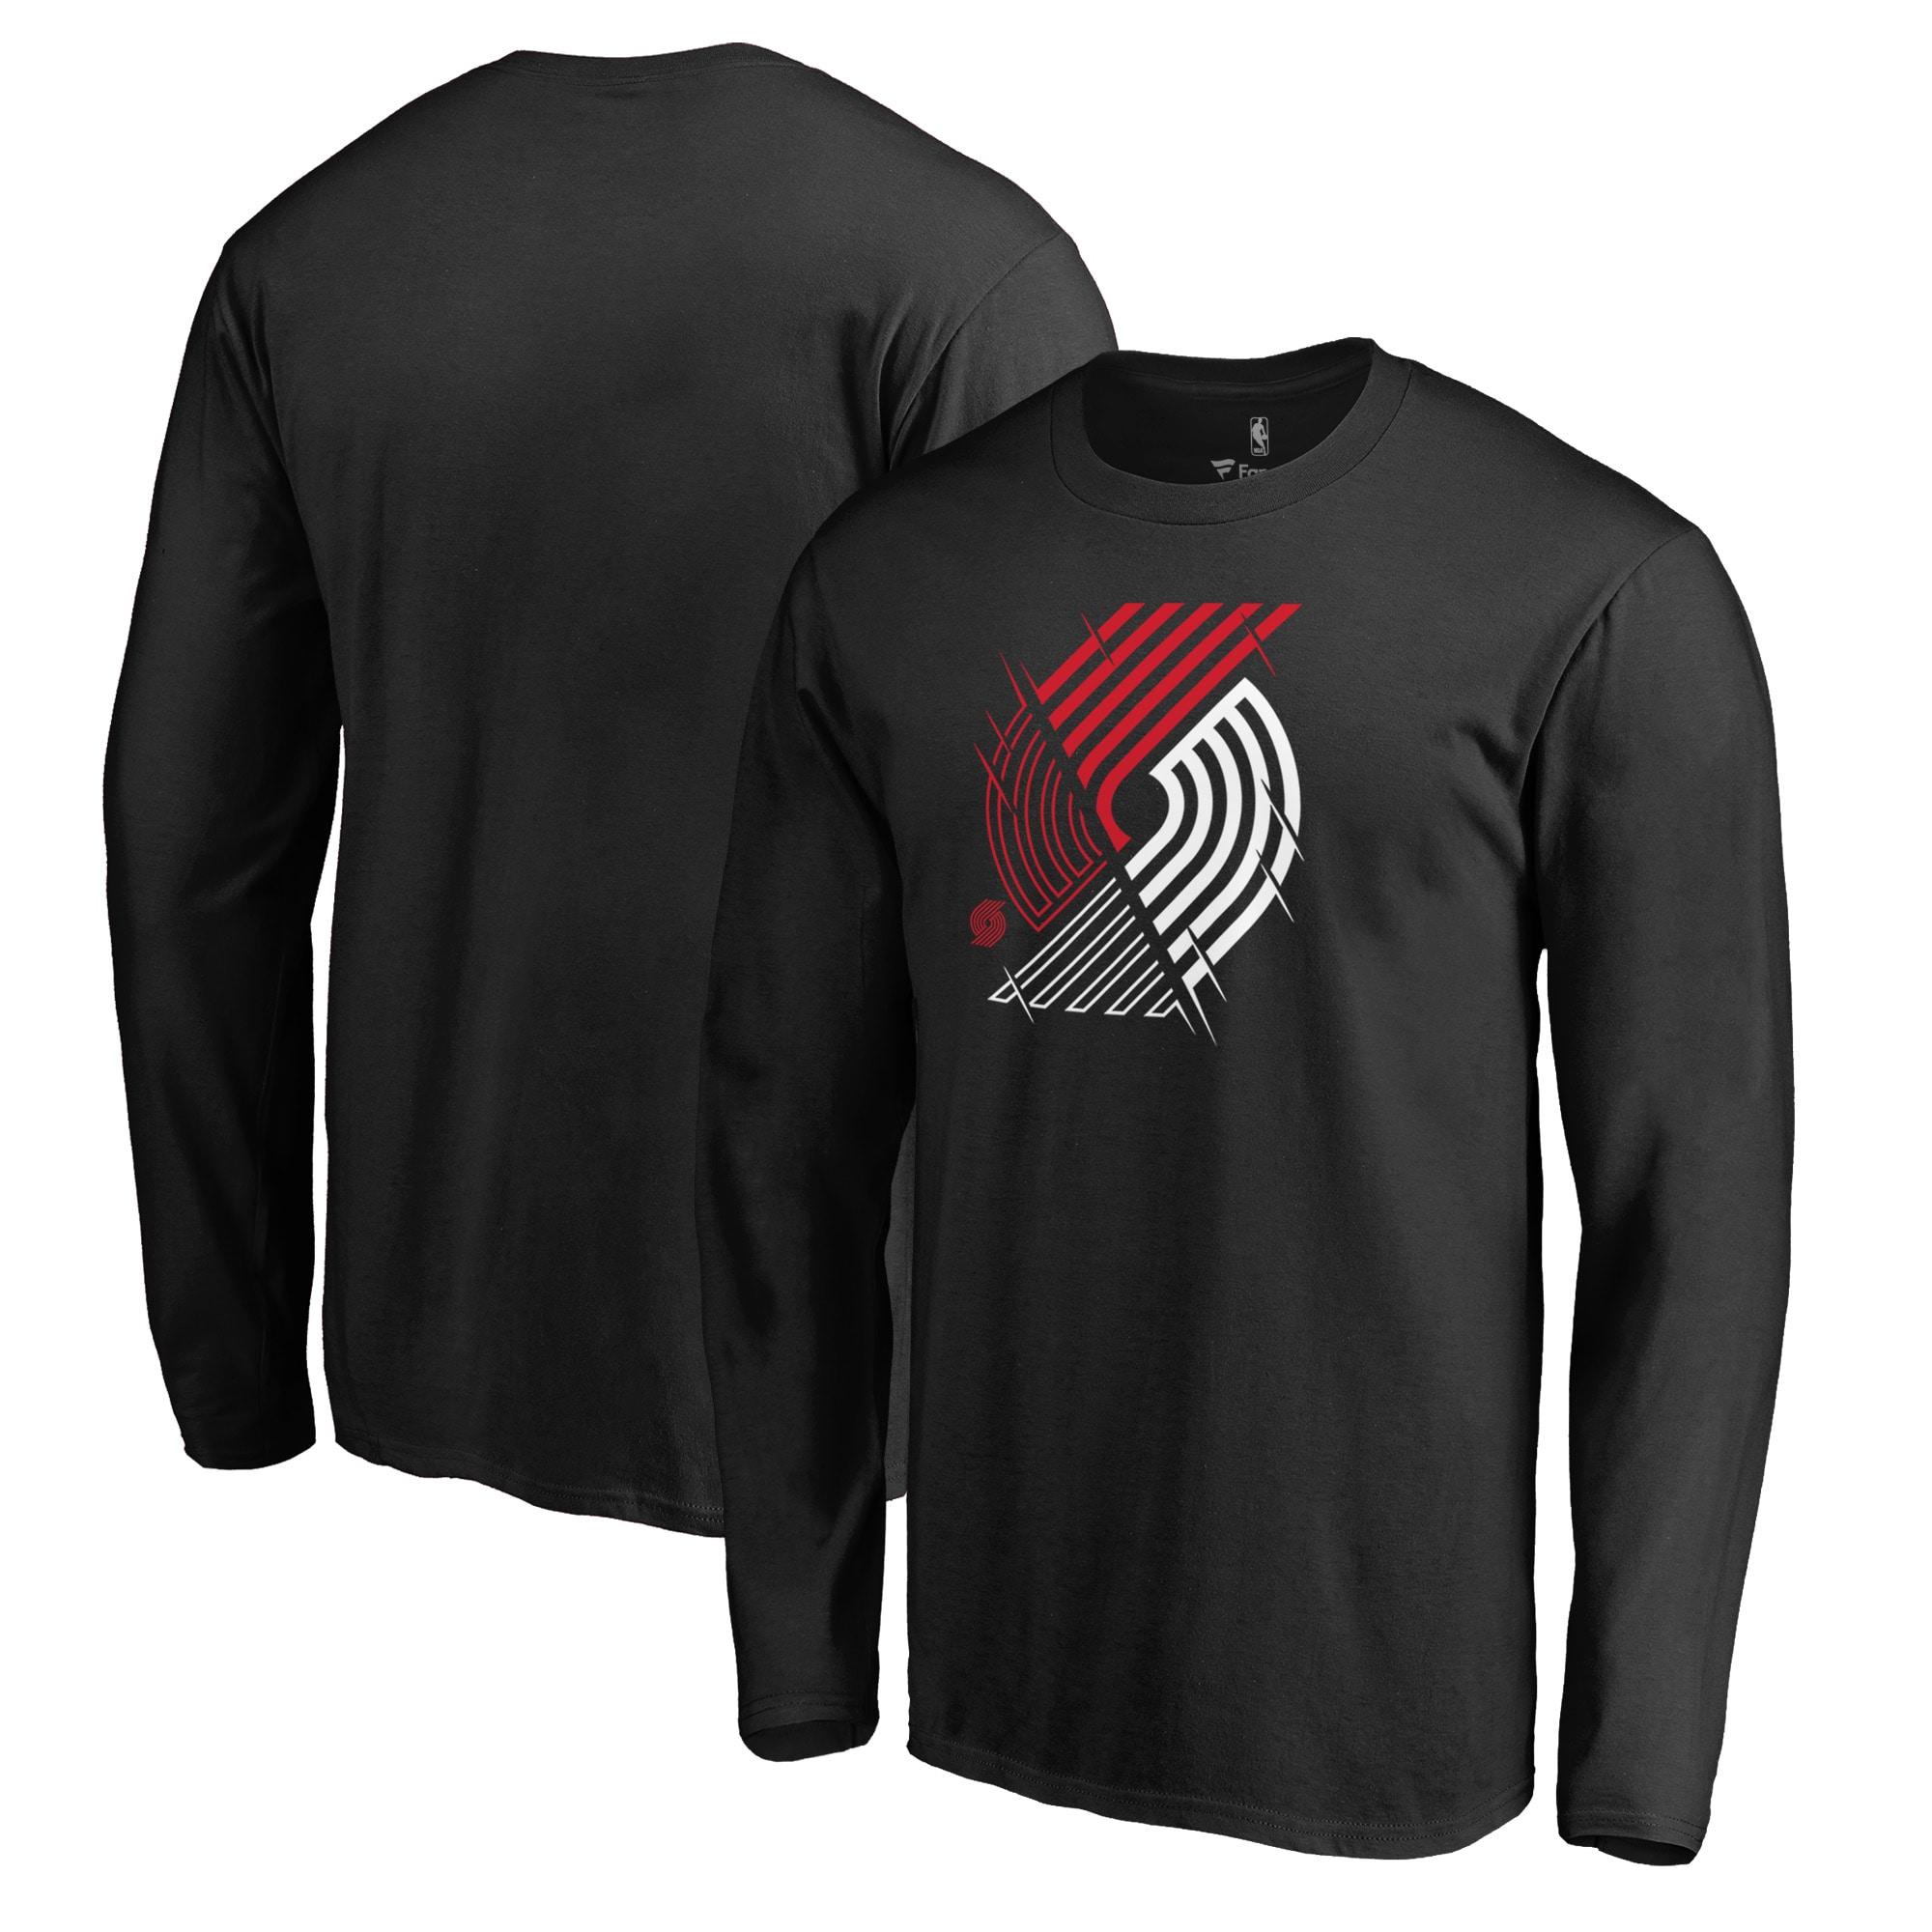 Portland Trail Blazers Fanatics Branded X-Ray Long Sleeve T-Shirt - Black